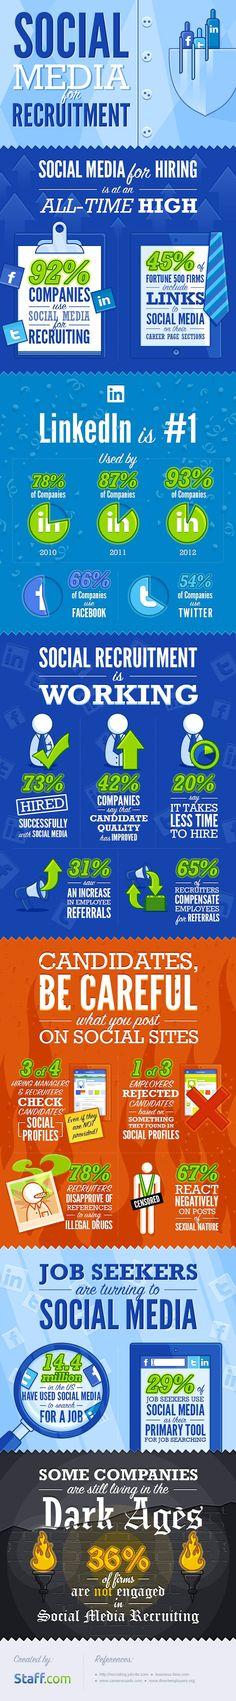 Social Media for Recruitment #infographic #SocialMedia #Recruitment